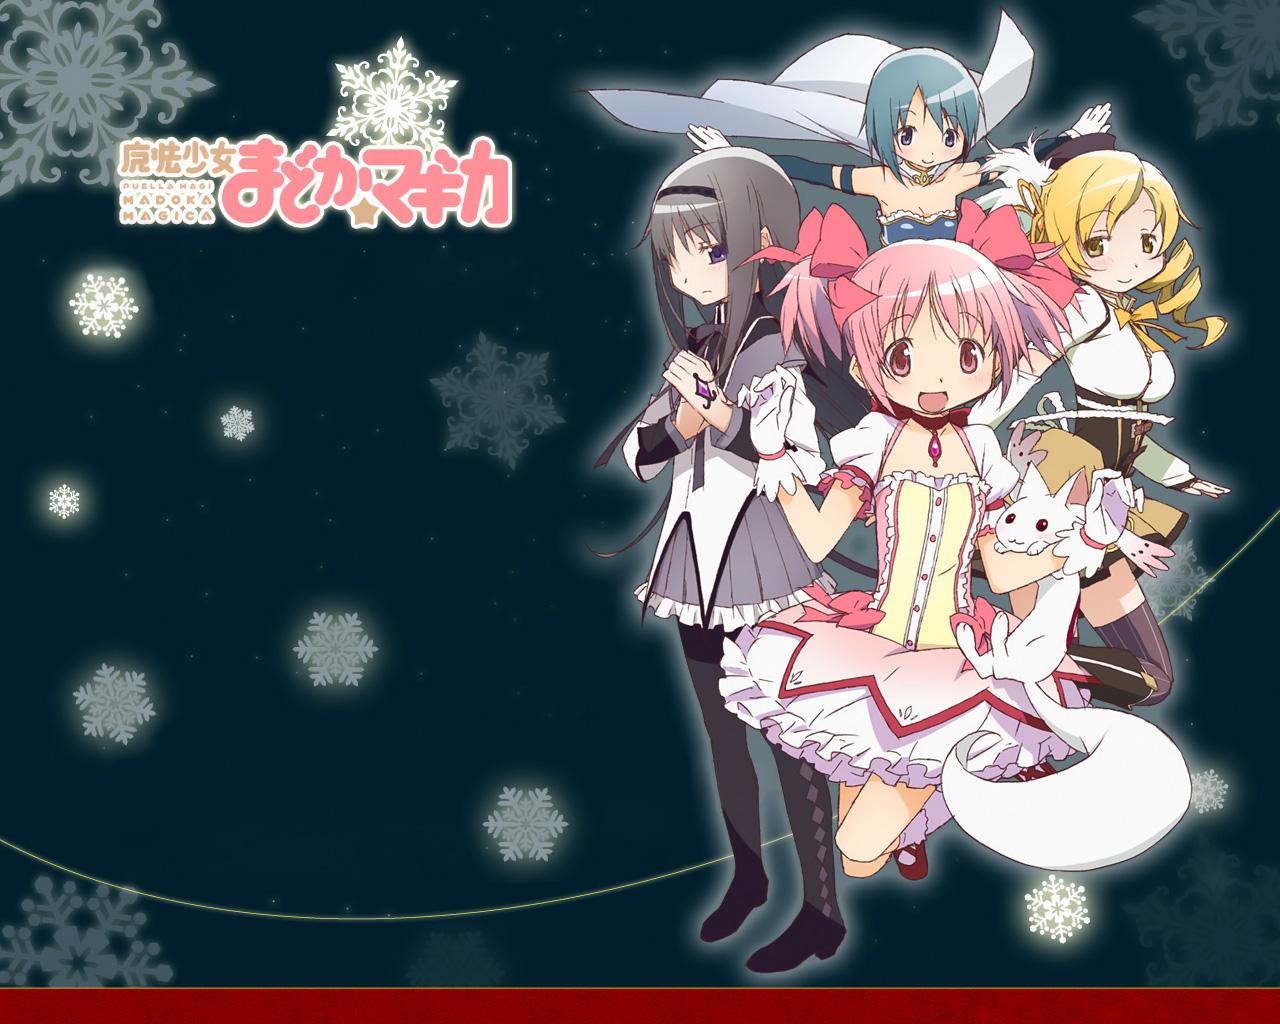 Images Mahou Shoujo Madoka Magica Anime